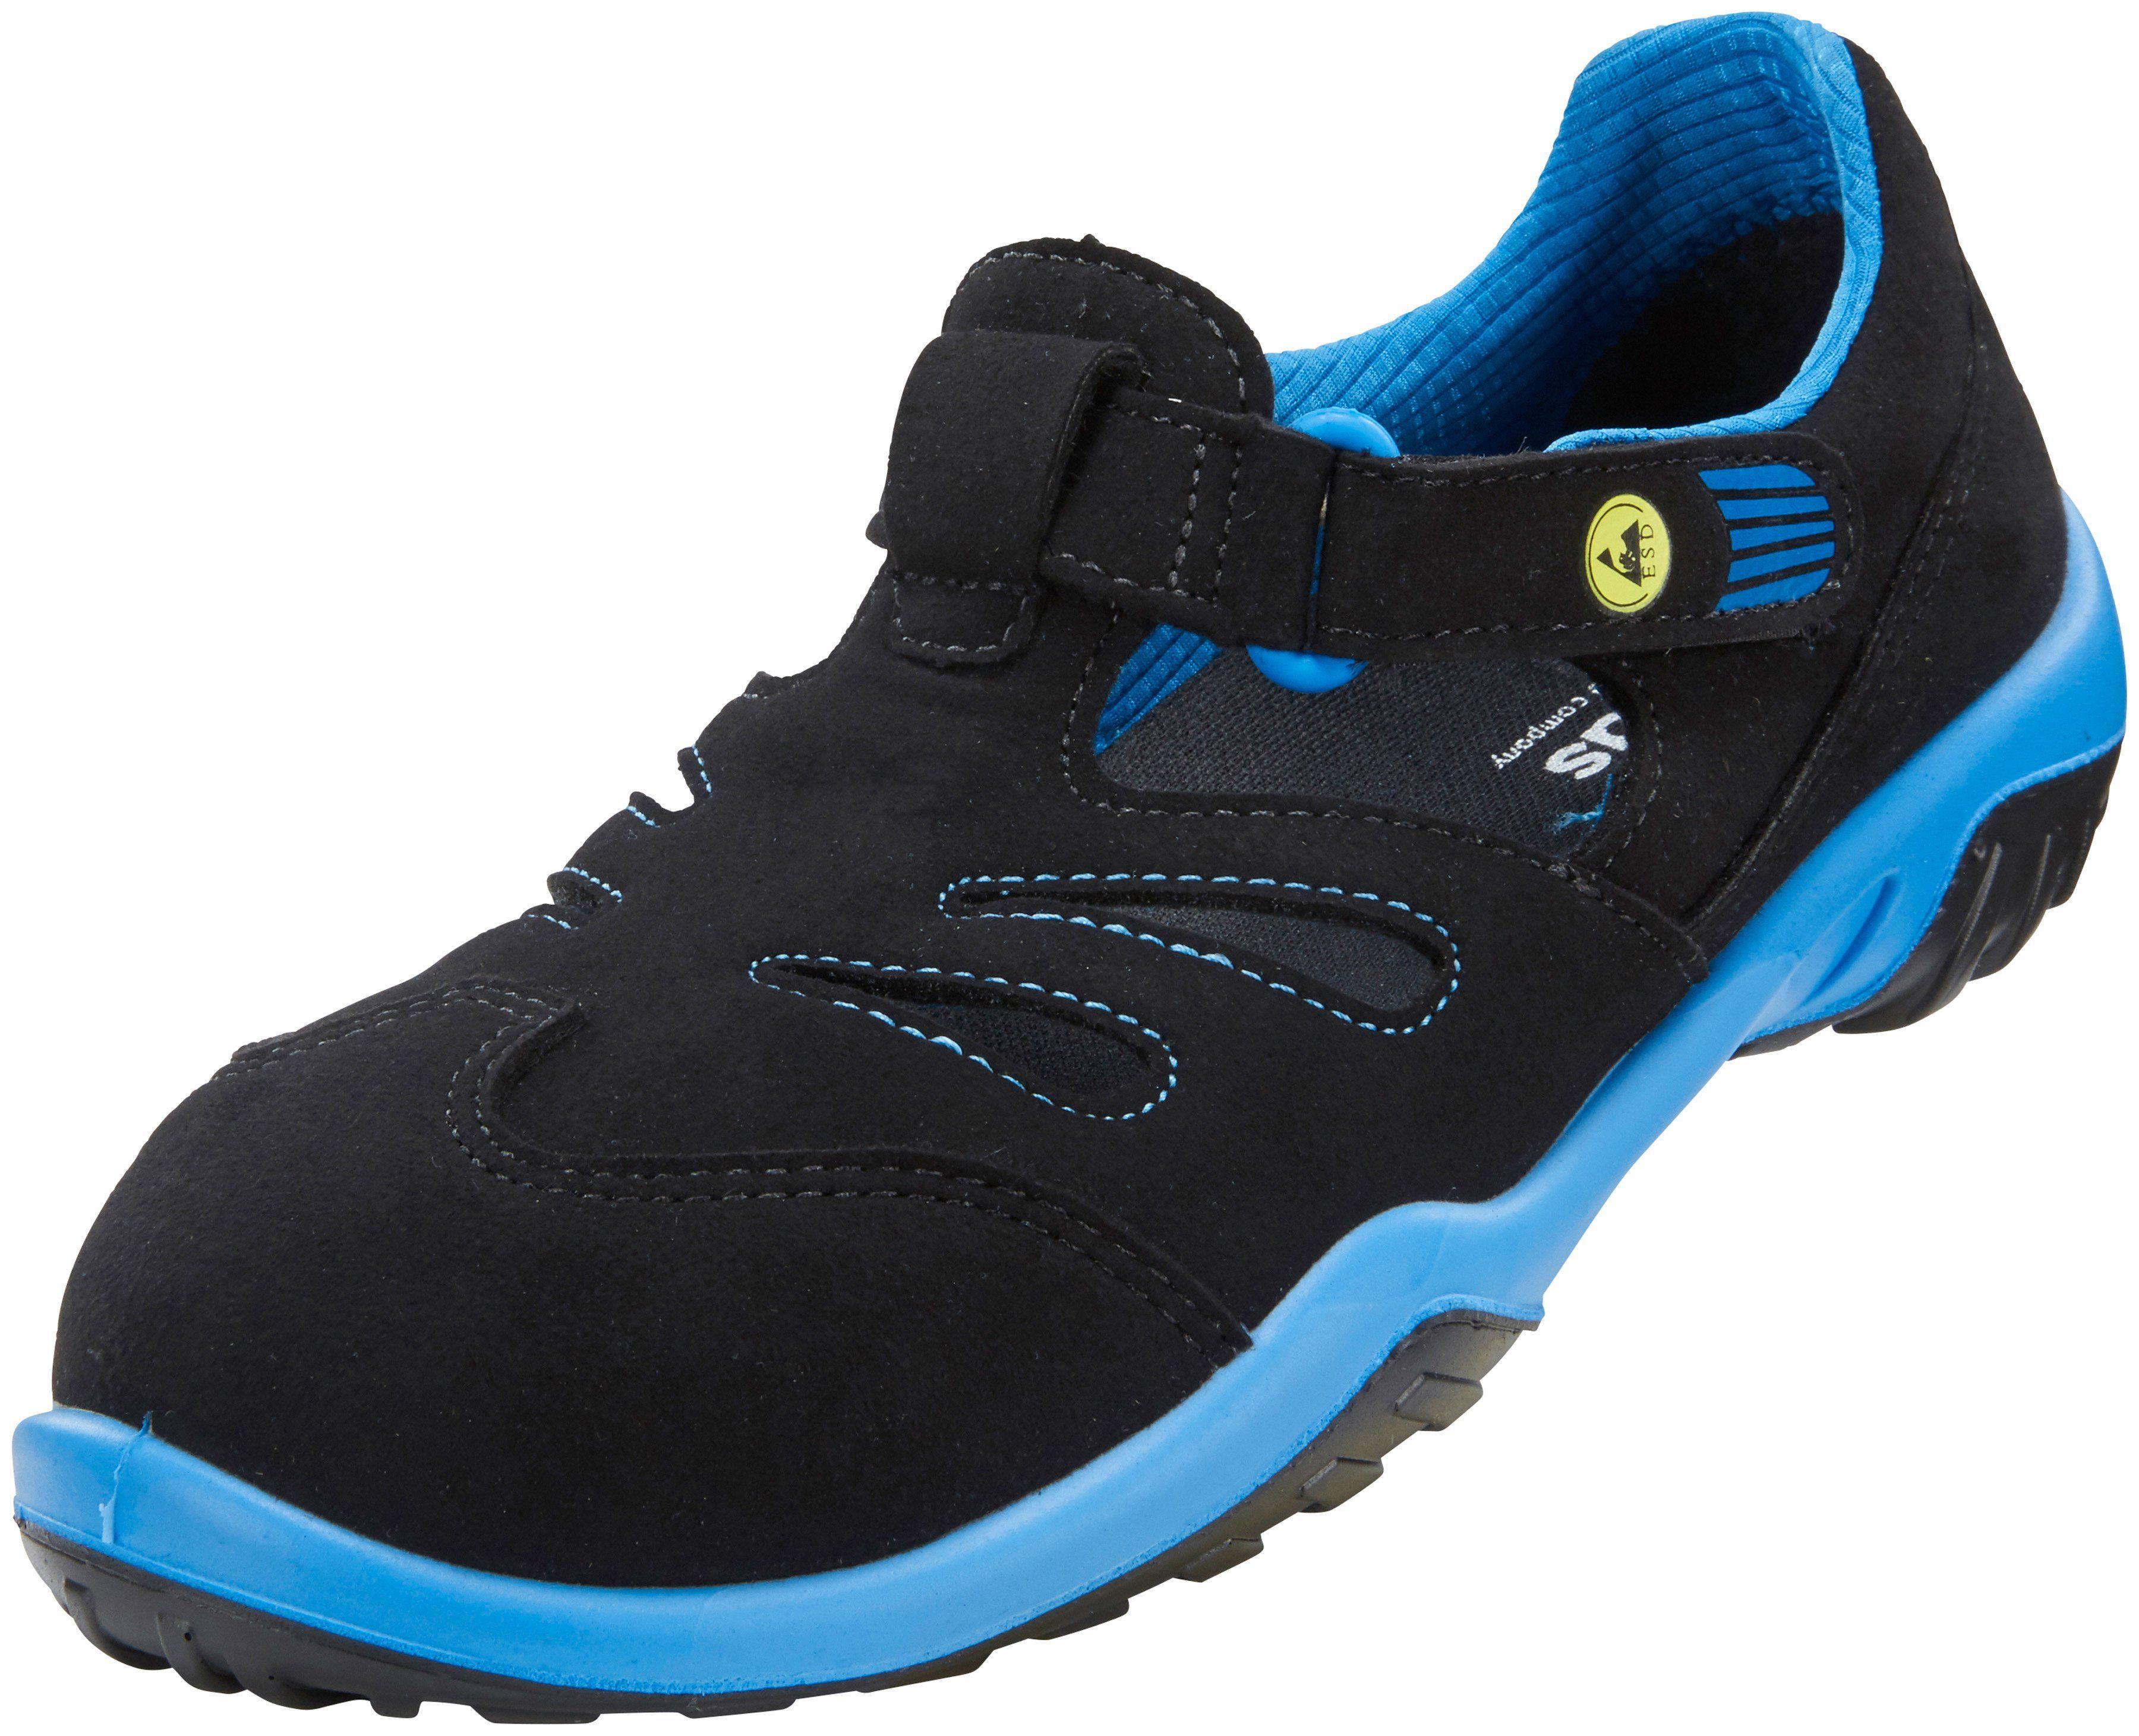 Atlas Damen-Sicherheitssandale GX 350 black  schwarz#ft5_slash#blau